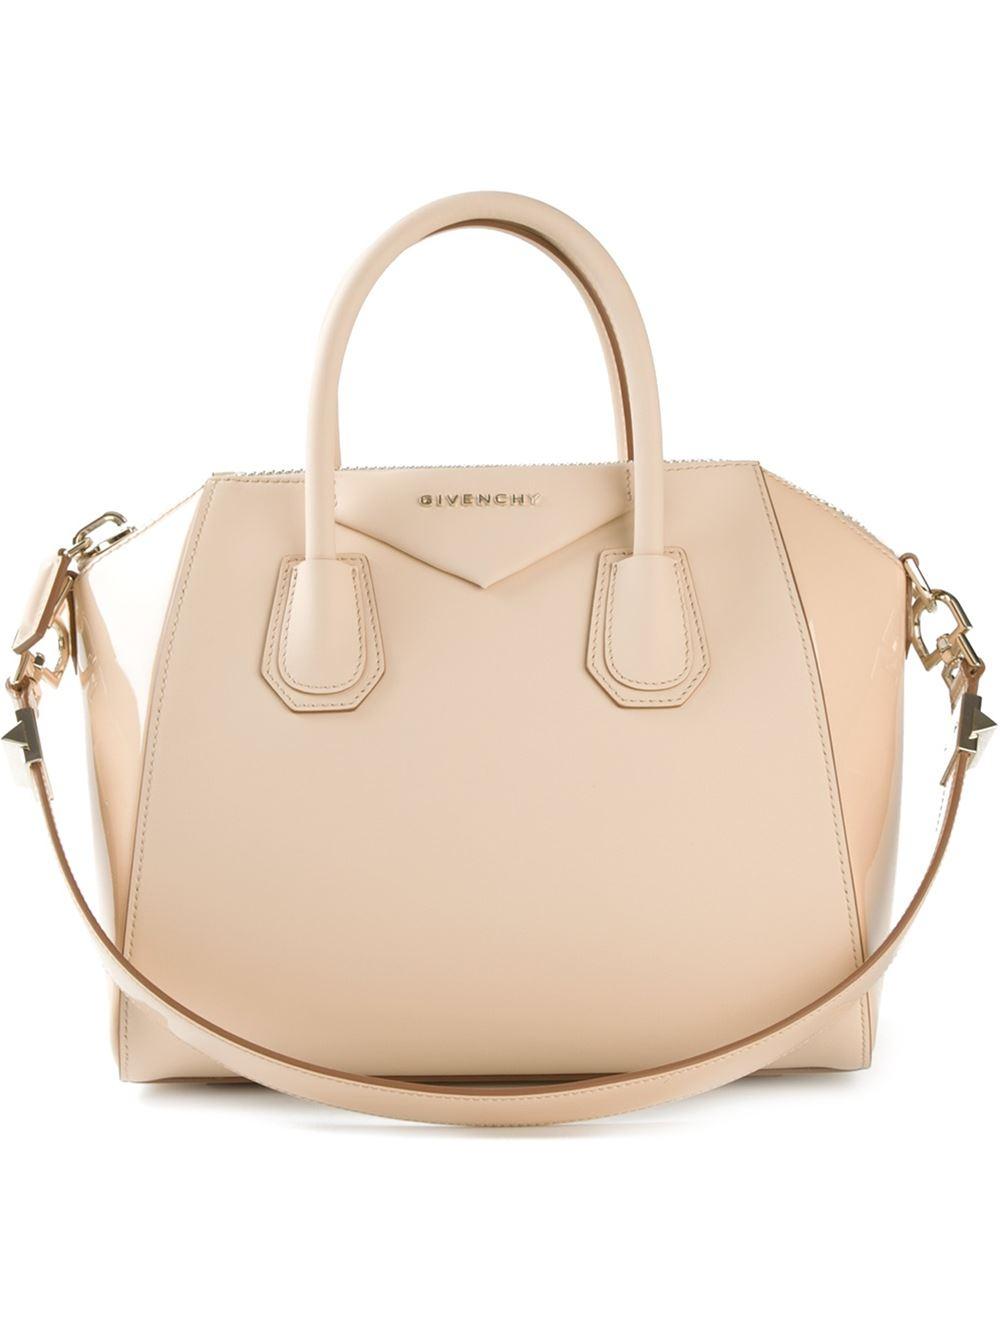 Antigona small tote bag - Nude & Neutrals Givenchy euSzoj8jgp